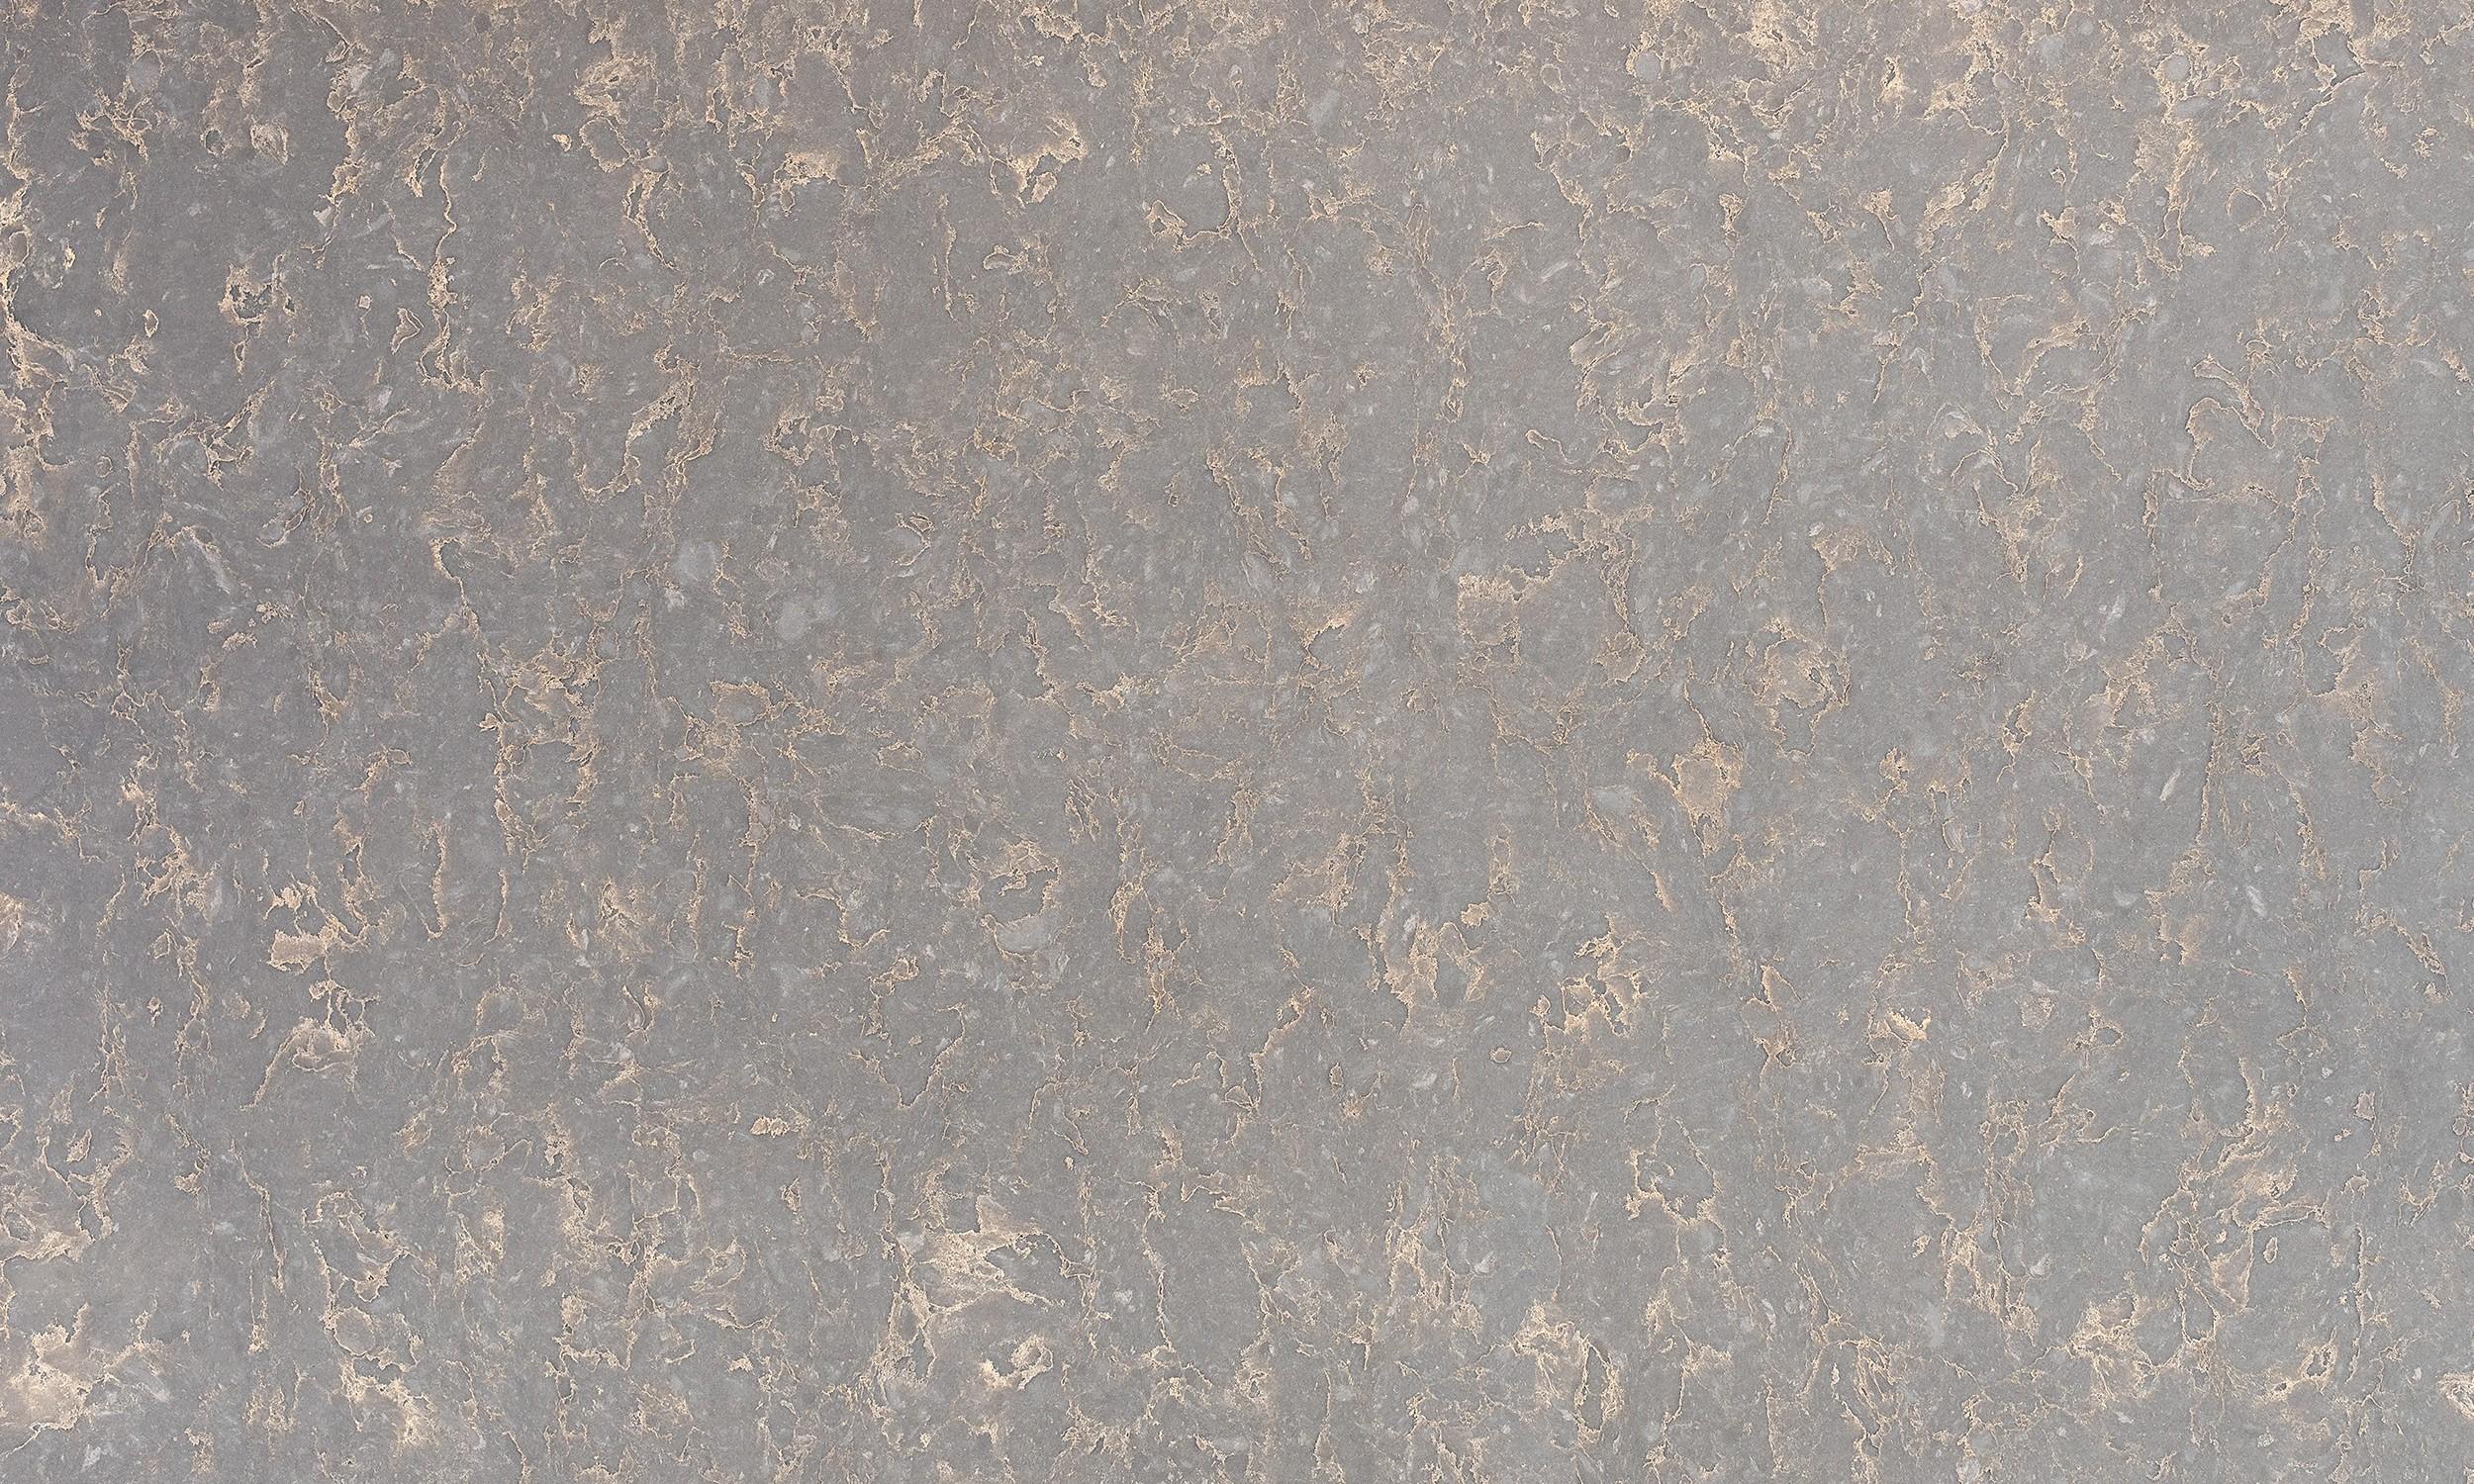 Wilsonart Quartz Sedona Stone And Tile